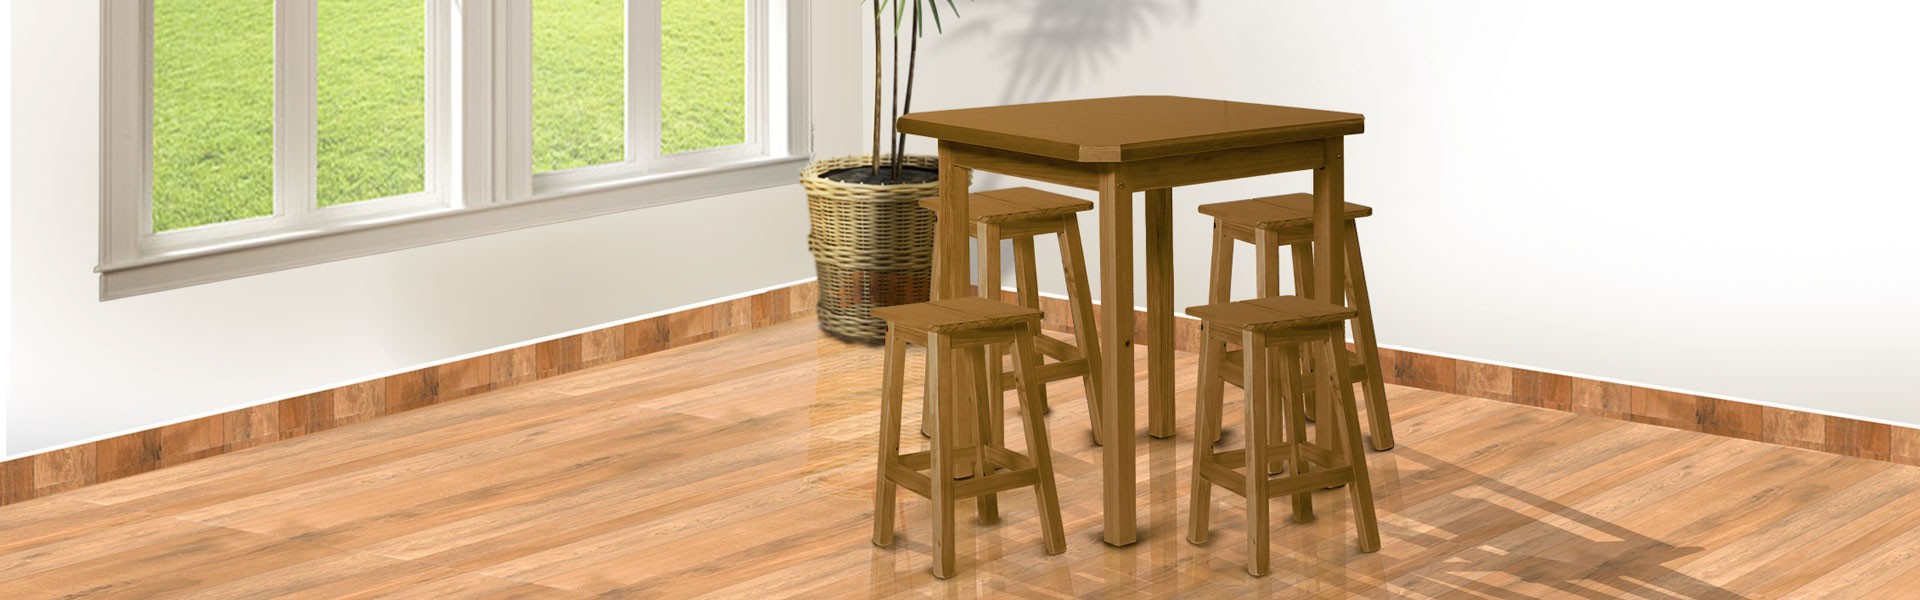 Conjunto mesa 0,75 x 0,75 com 4 banquetas em pinus imbuia